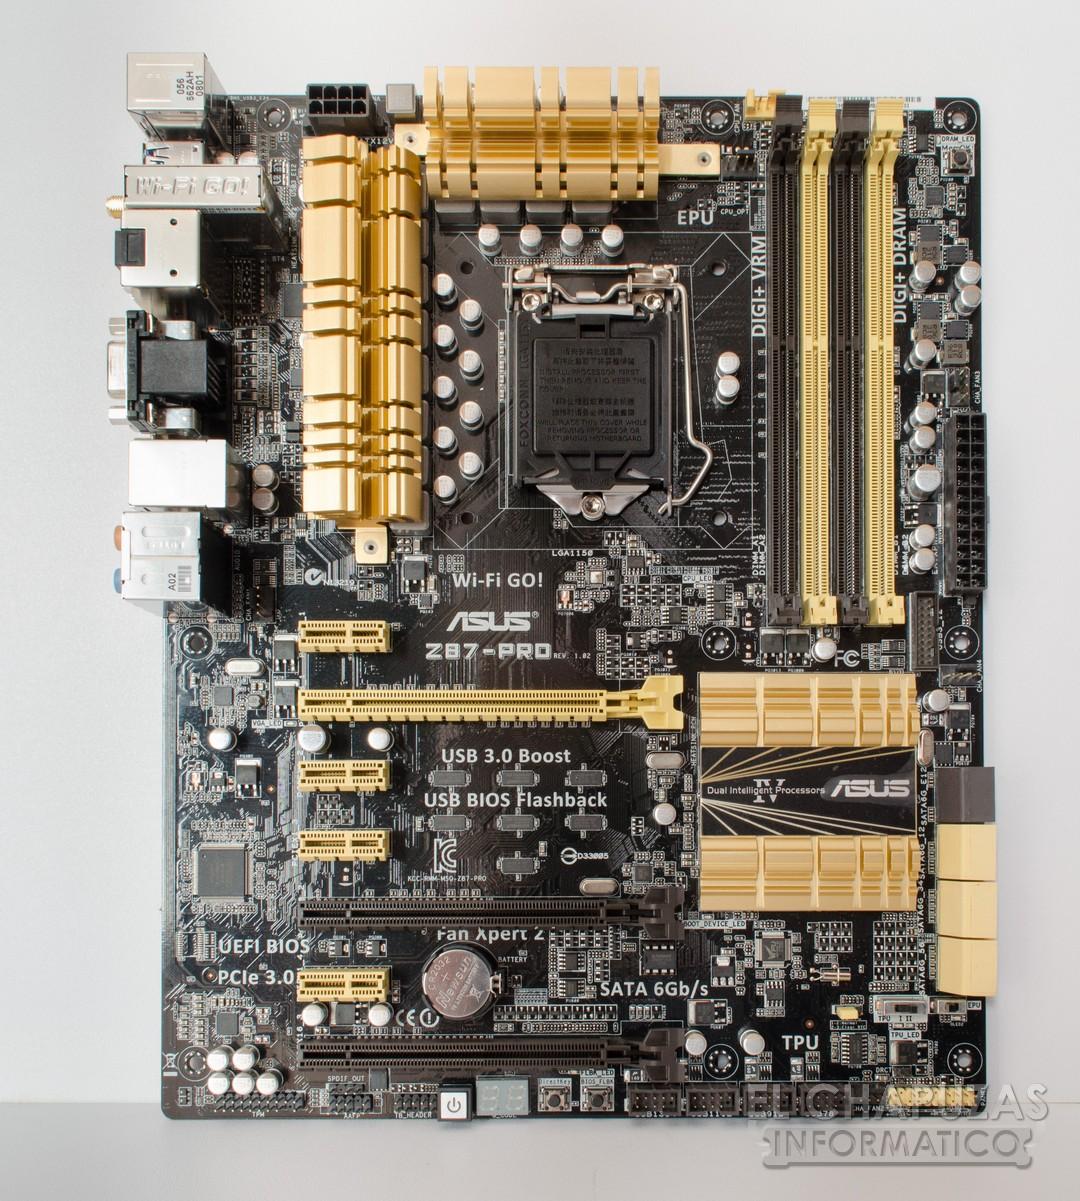 ASUS Z87I-PRO ASMEDIA USB 3.0 DRIVER FOR MAC DOWNLOAD